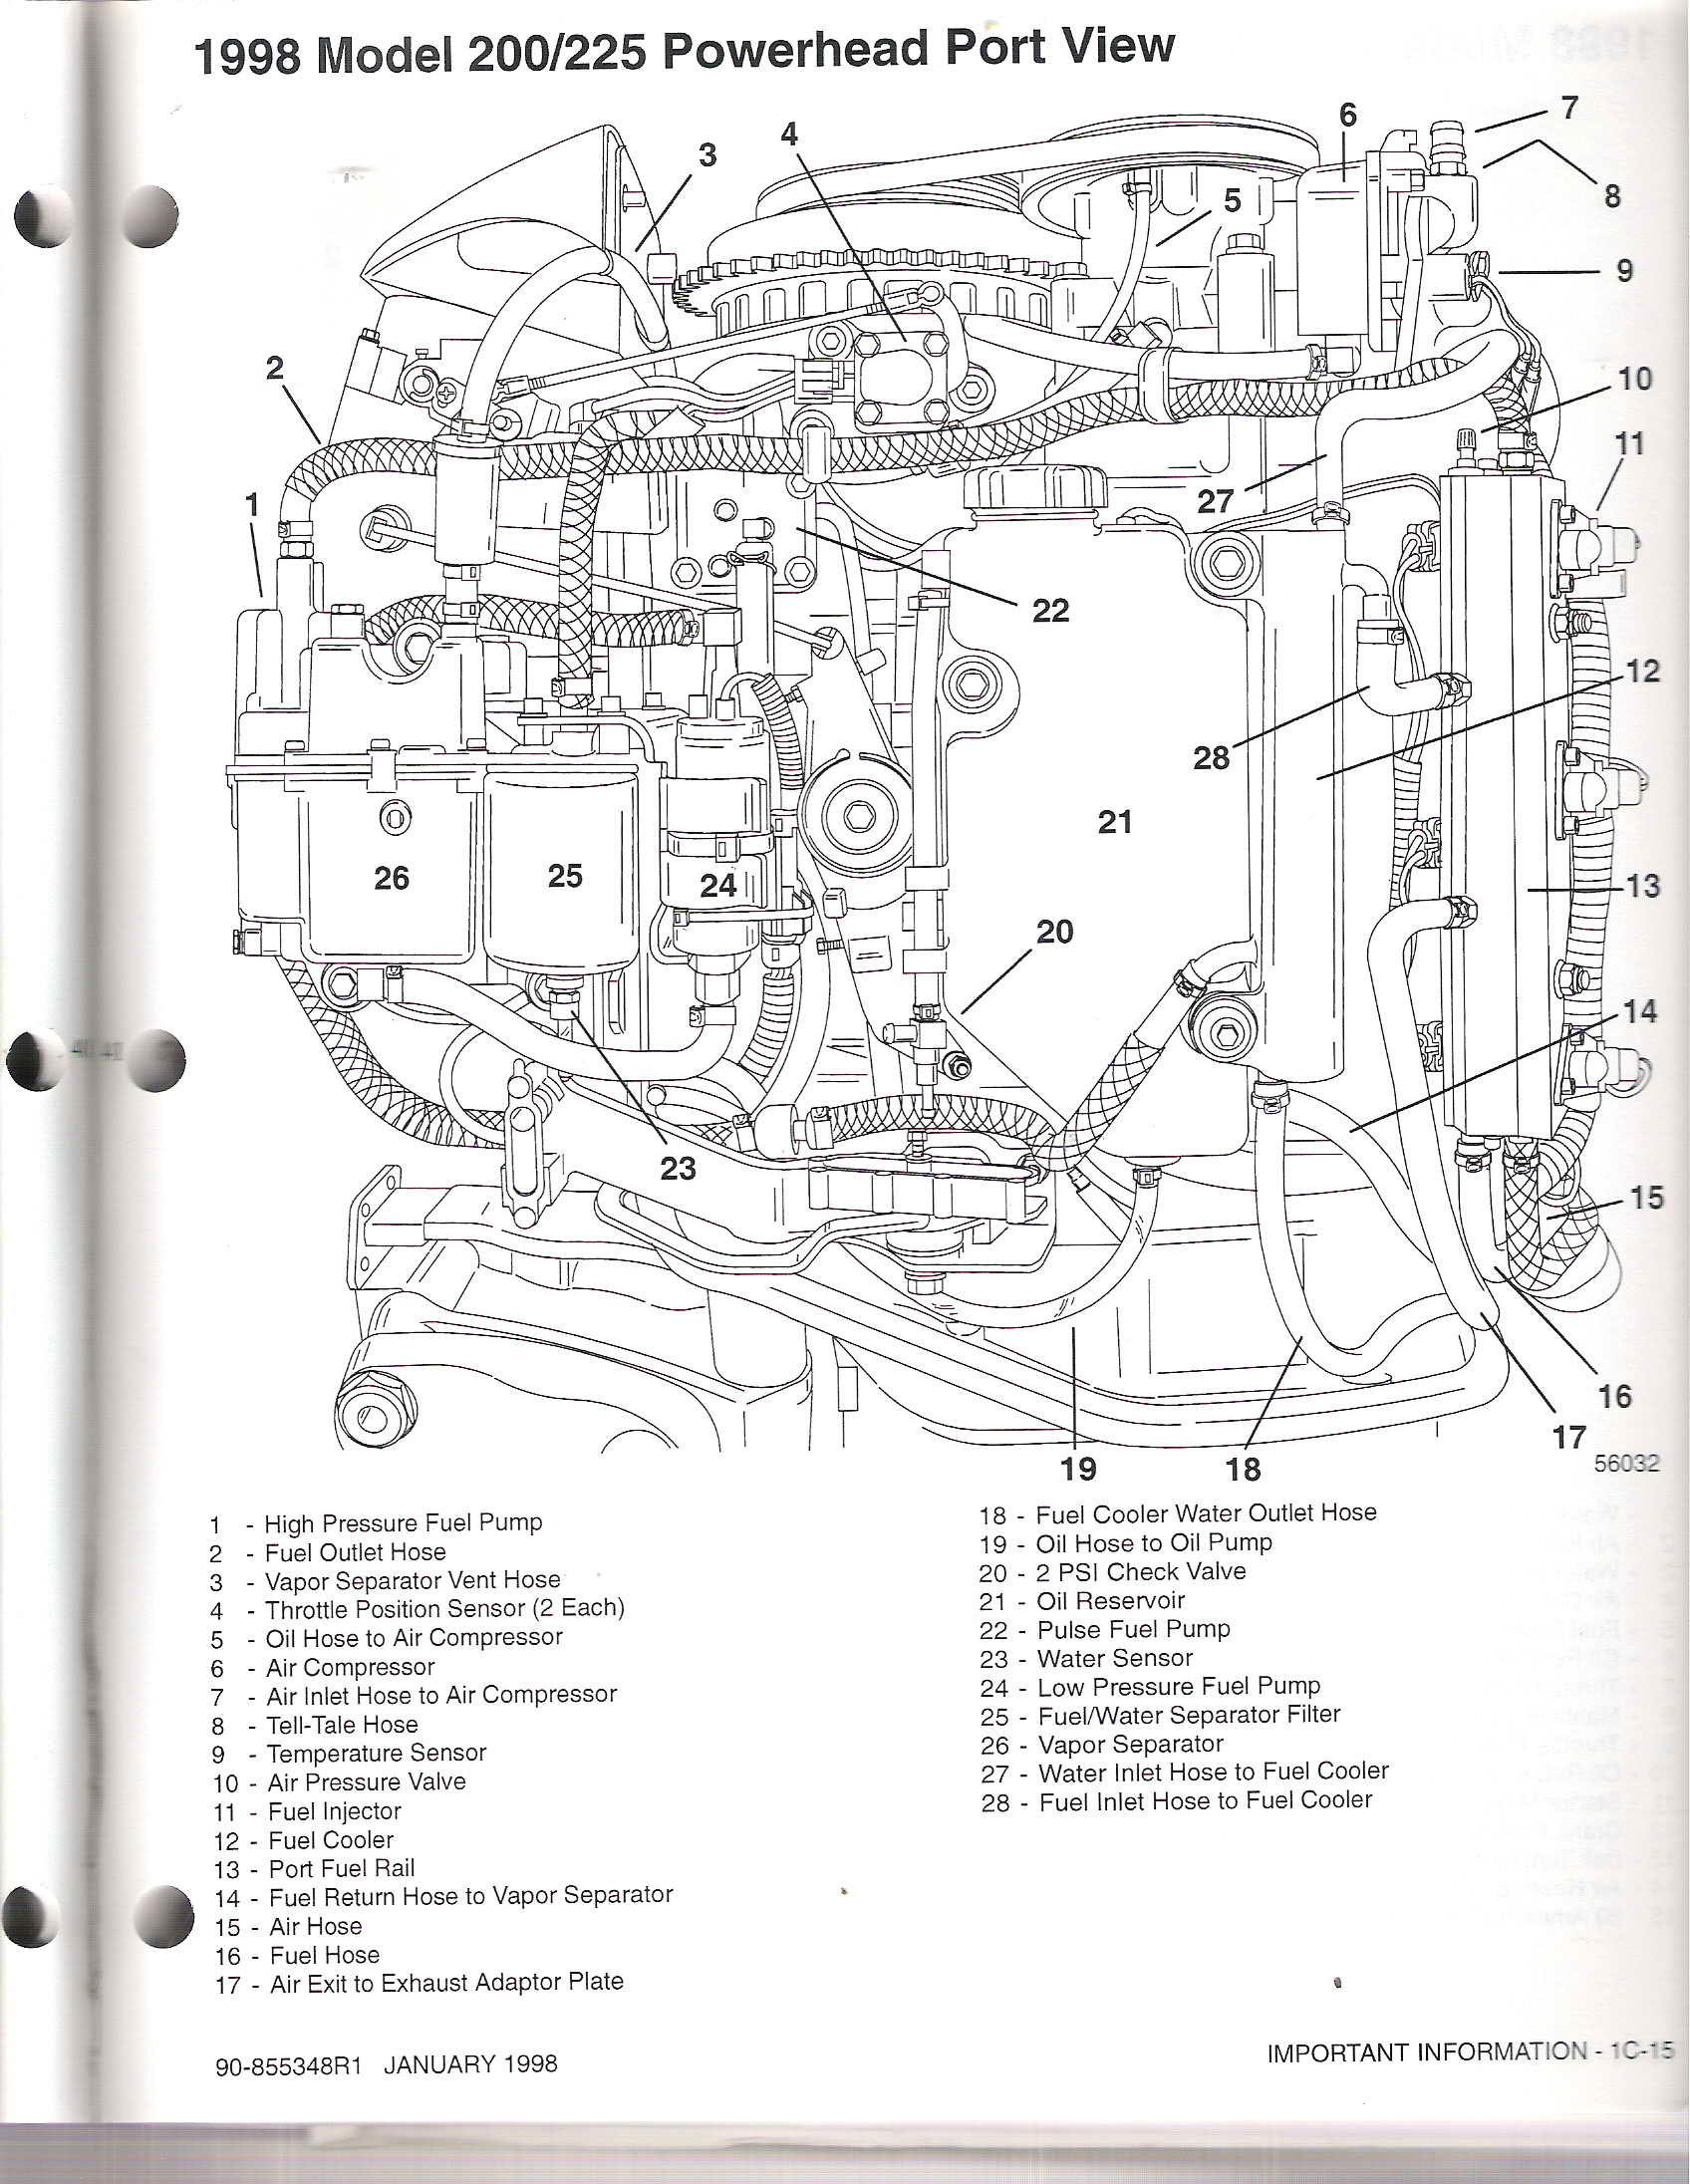 Wiring Diagram: 35 Optimax Fuel System Diagram